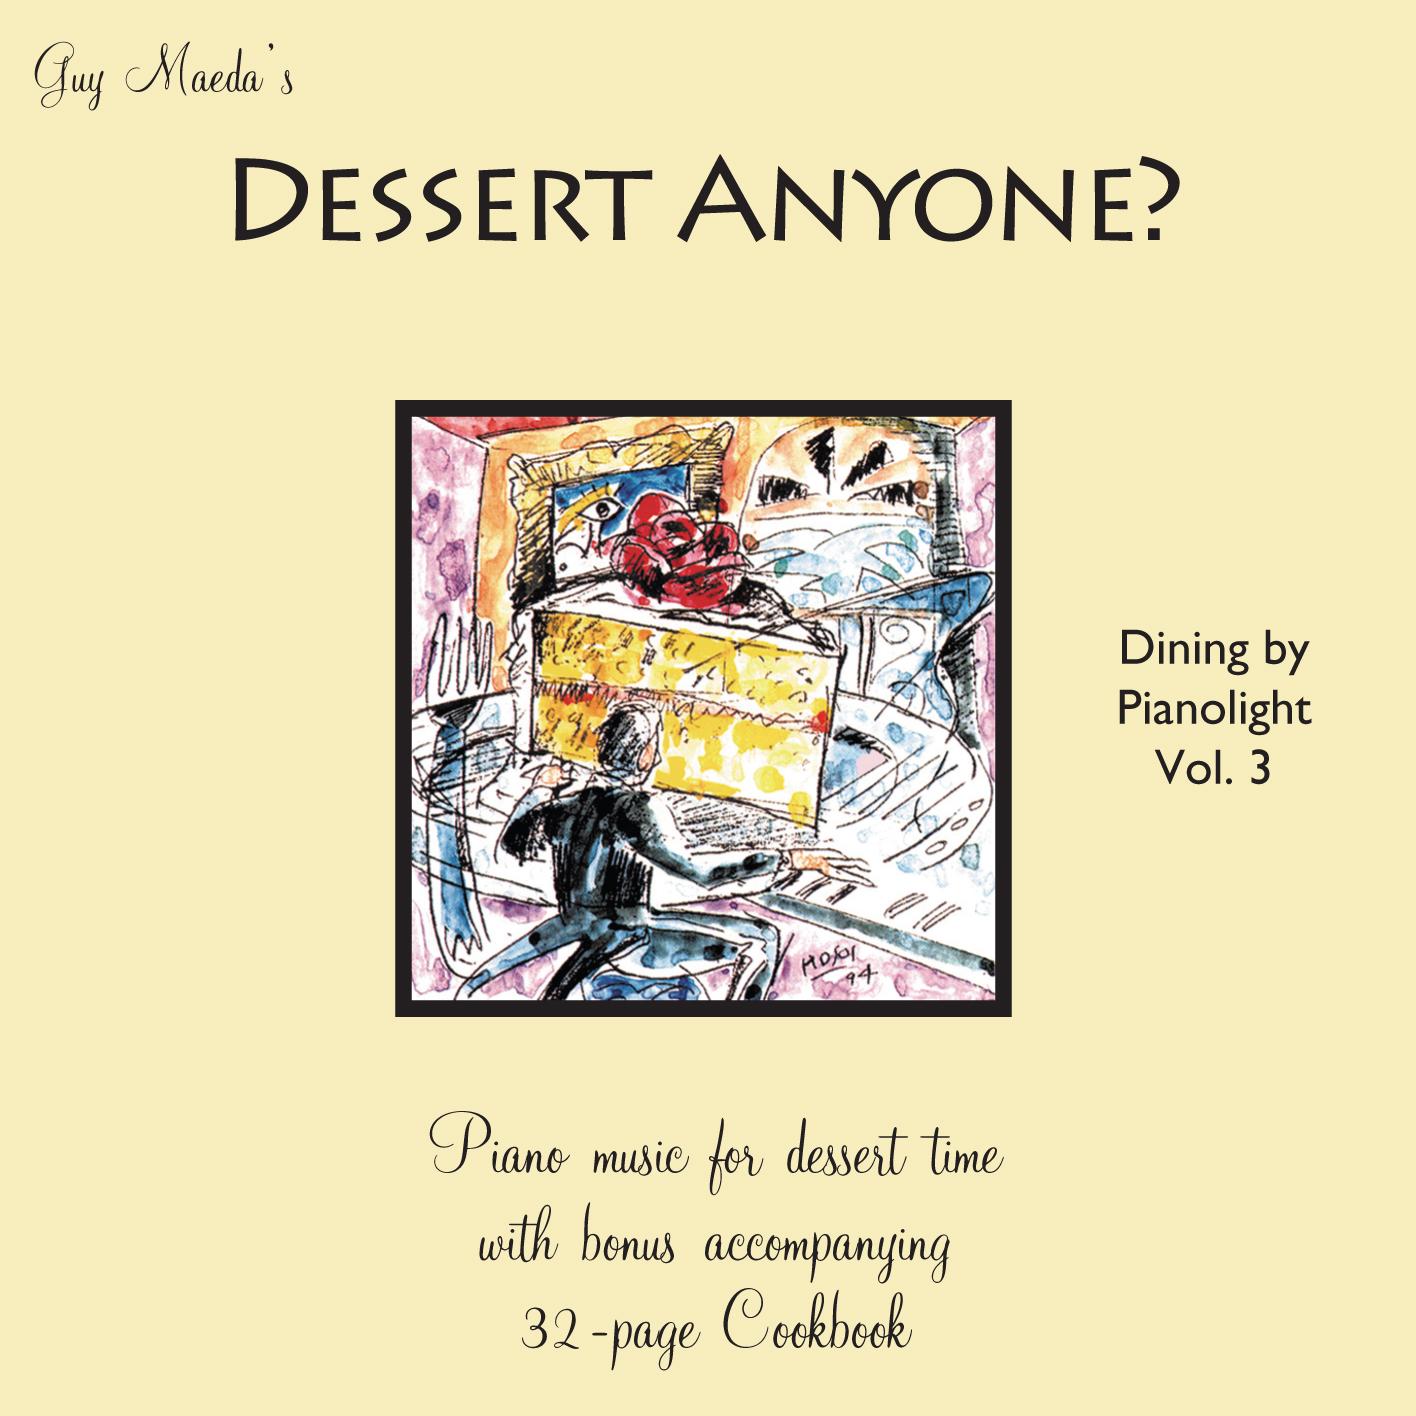 Dessert, Anyone?